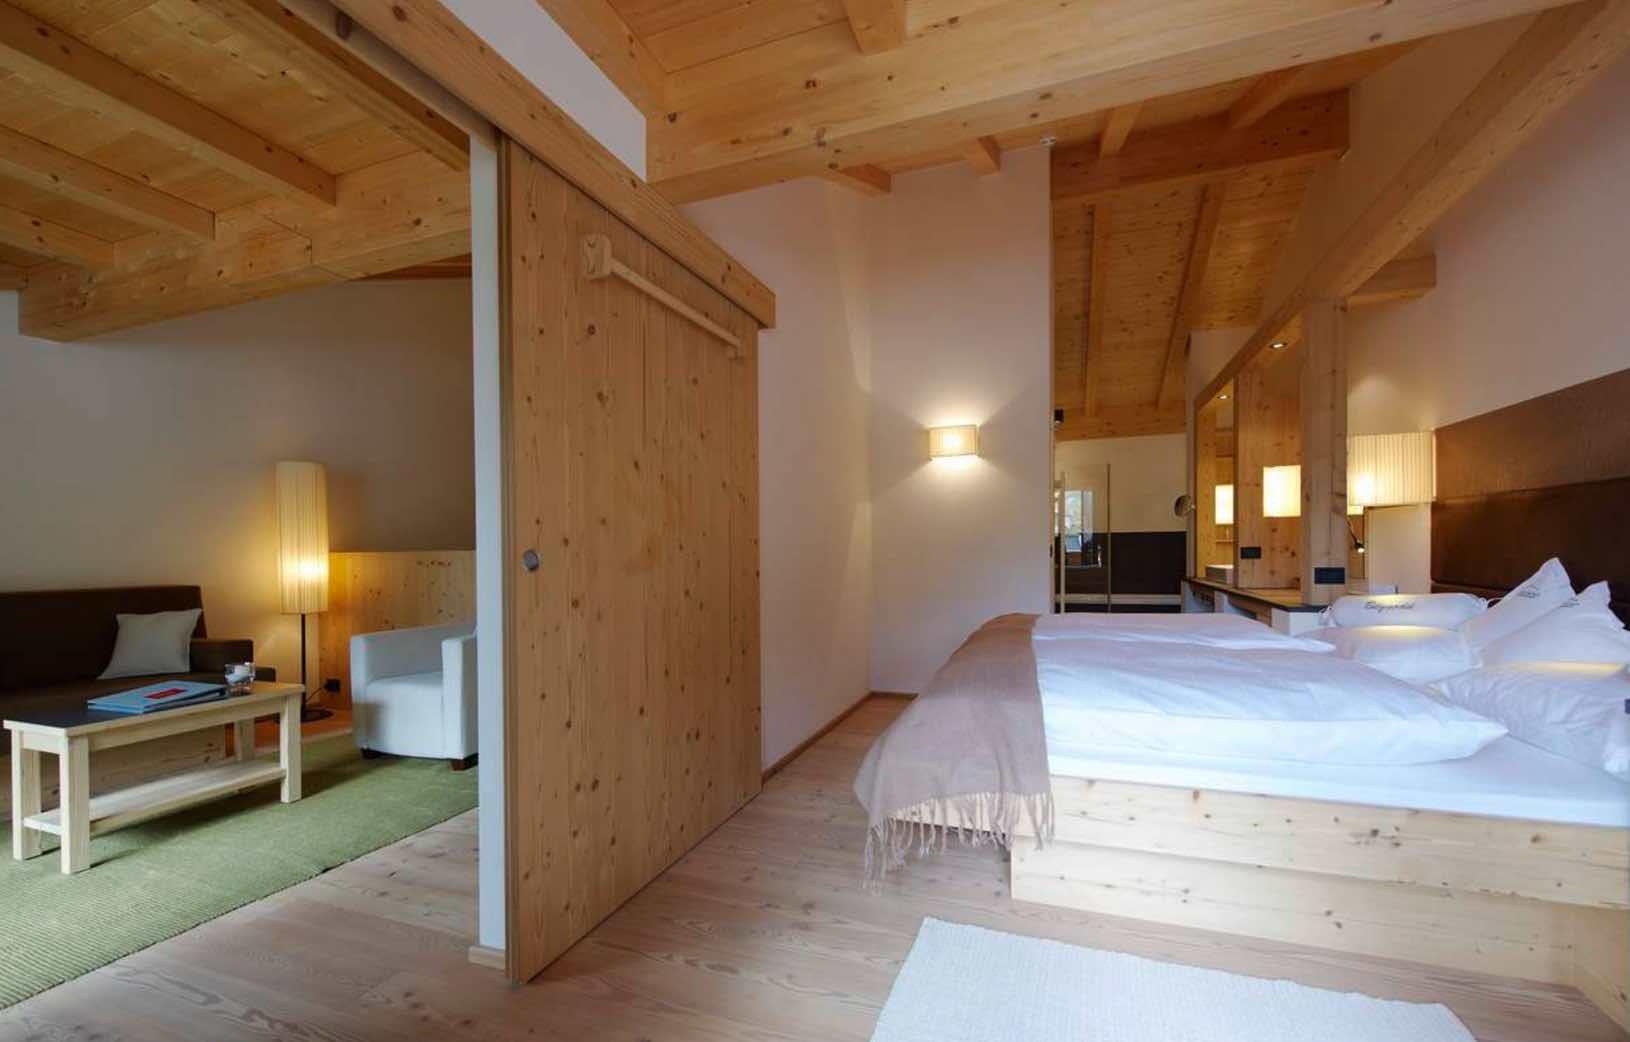 Lagació Mountain Residence - Hotels Dolomites Italy 7.jpg